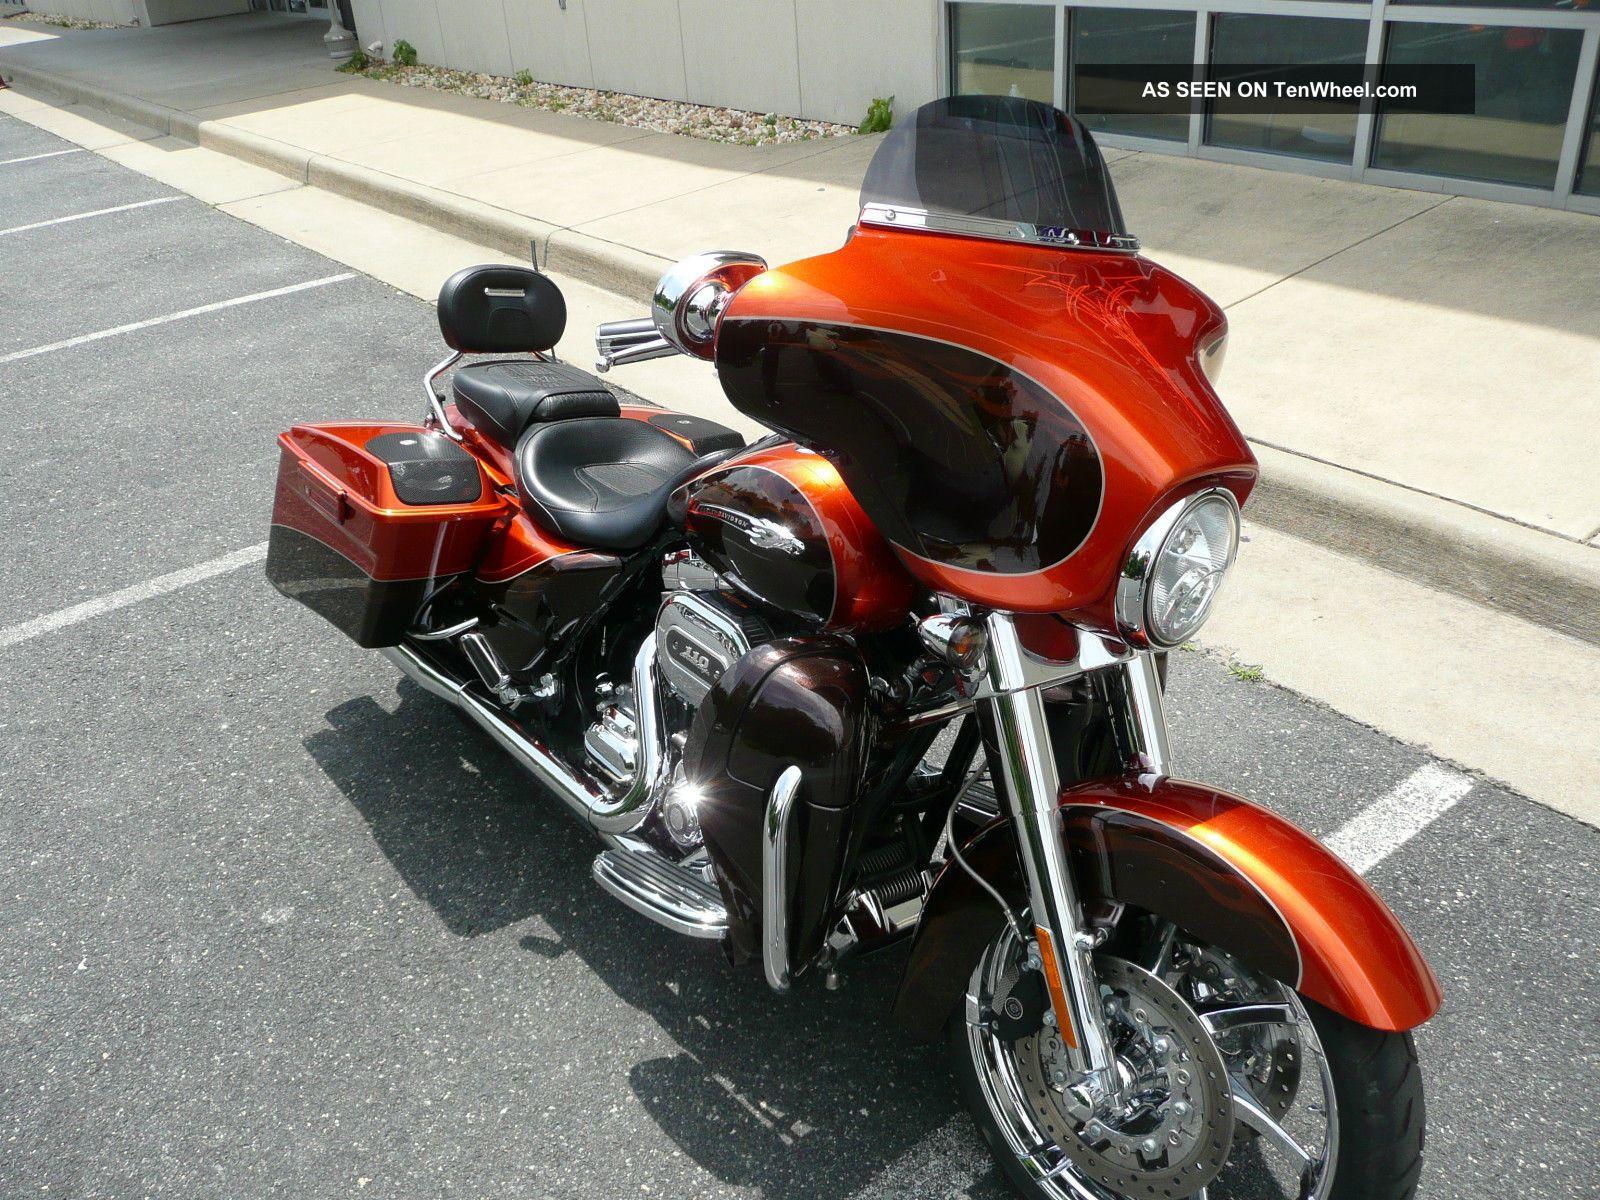 2012 Street Glide Screamin Eagle For Sale.html | Autos Weblog